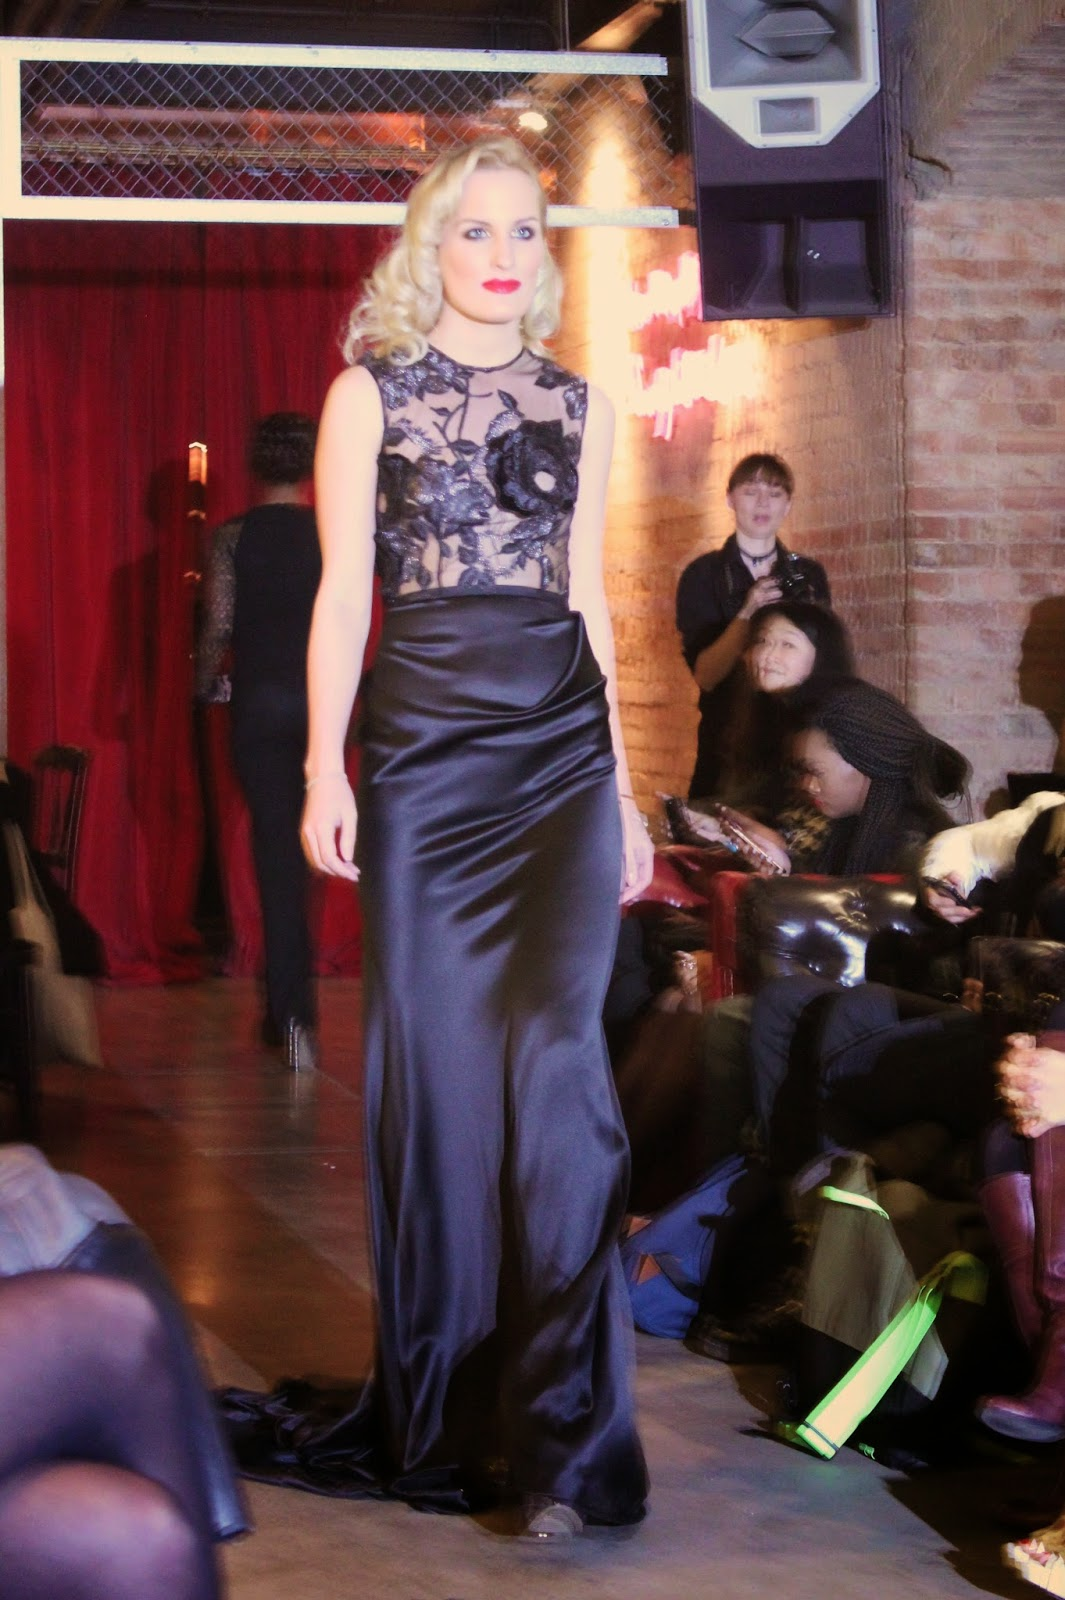 london-fashion-week-lfw-kolchagov-barba-catwalk-models-runway-dresses-collection-spring-summer-2015-ss15